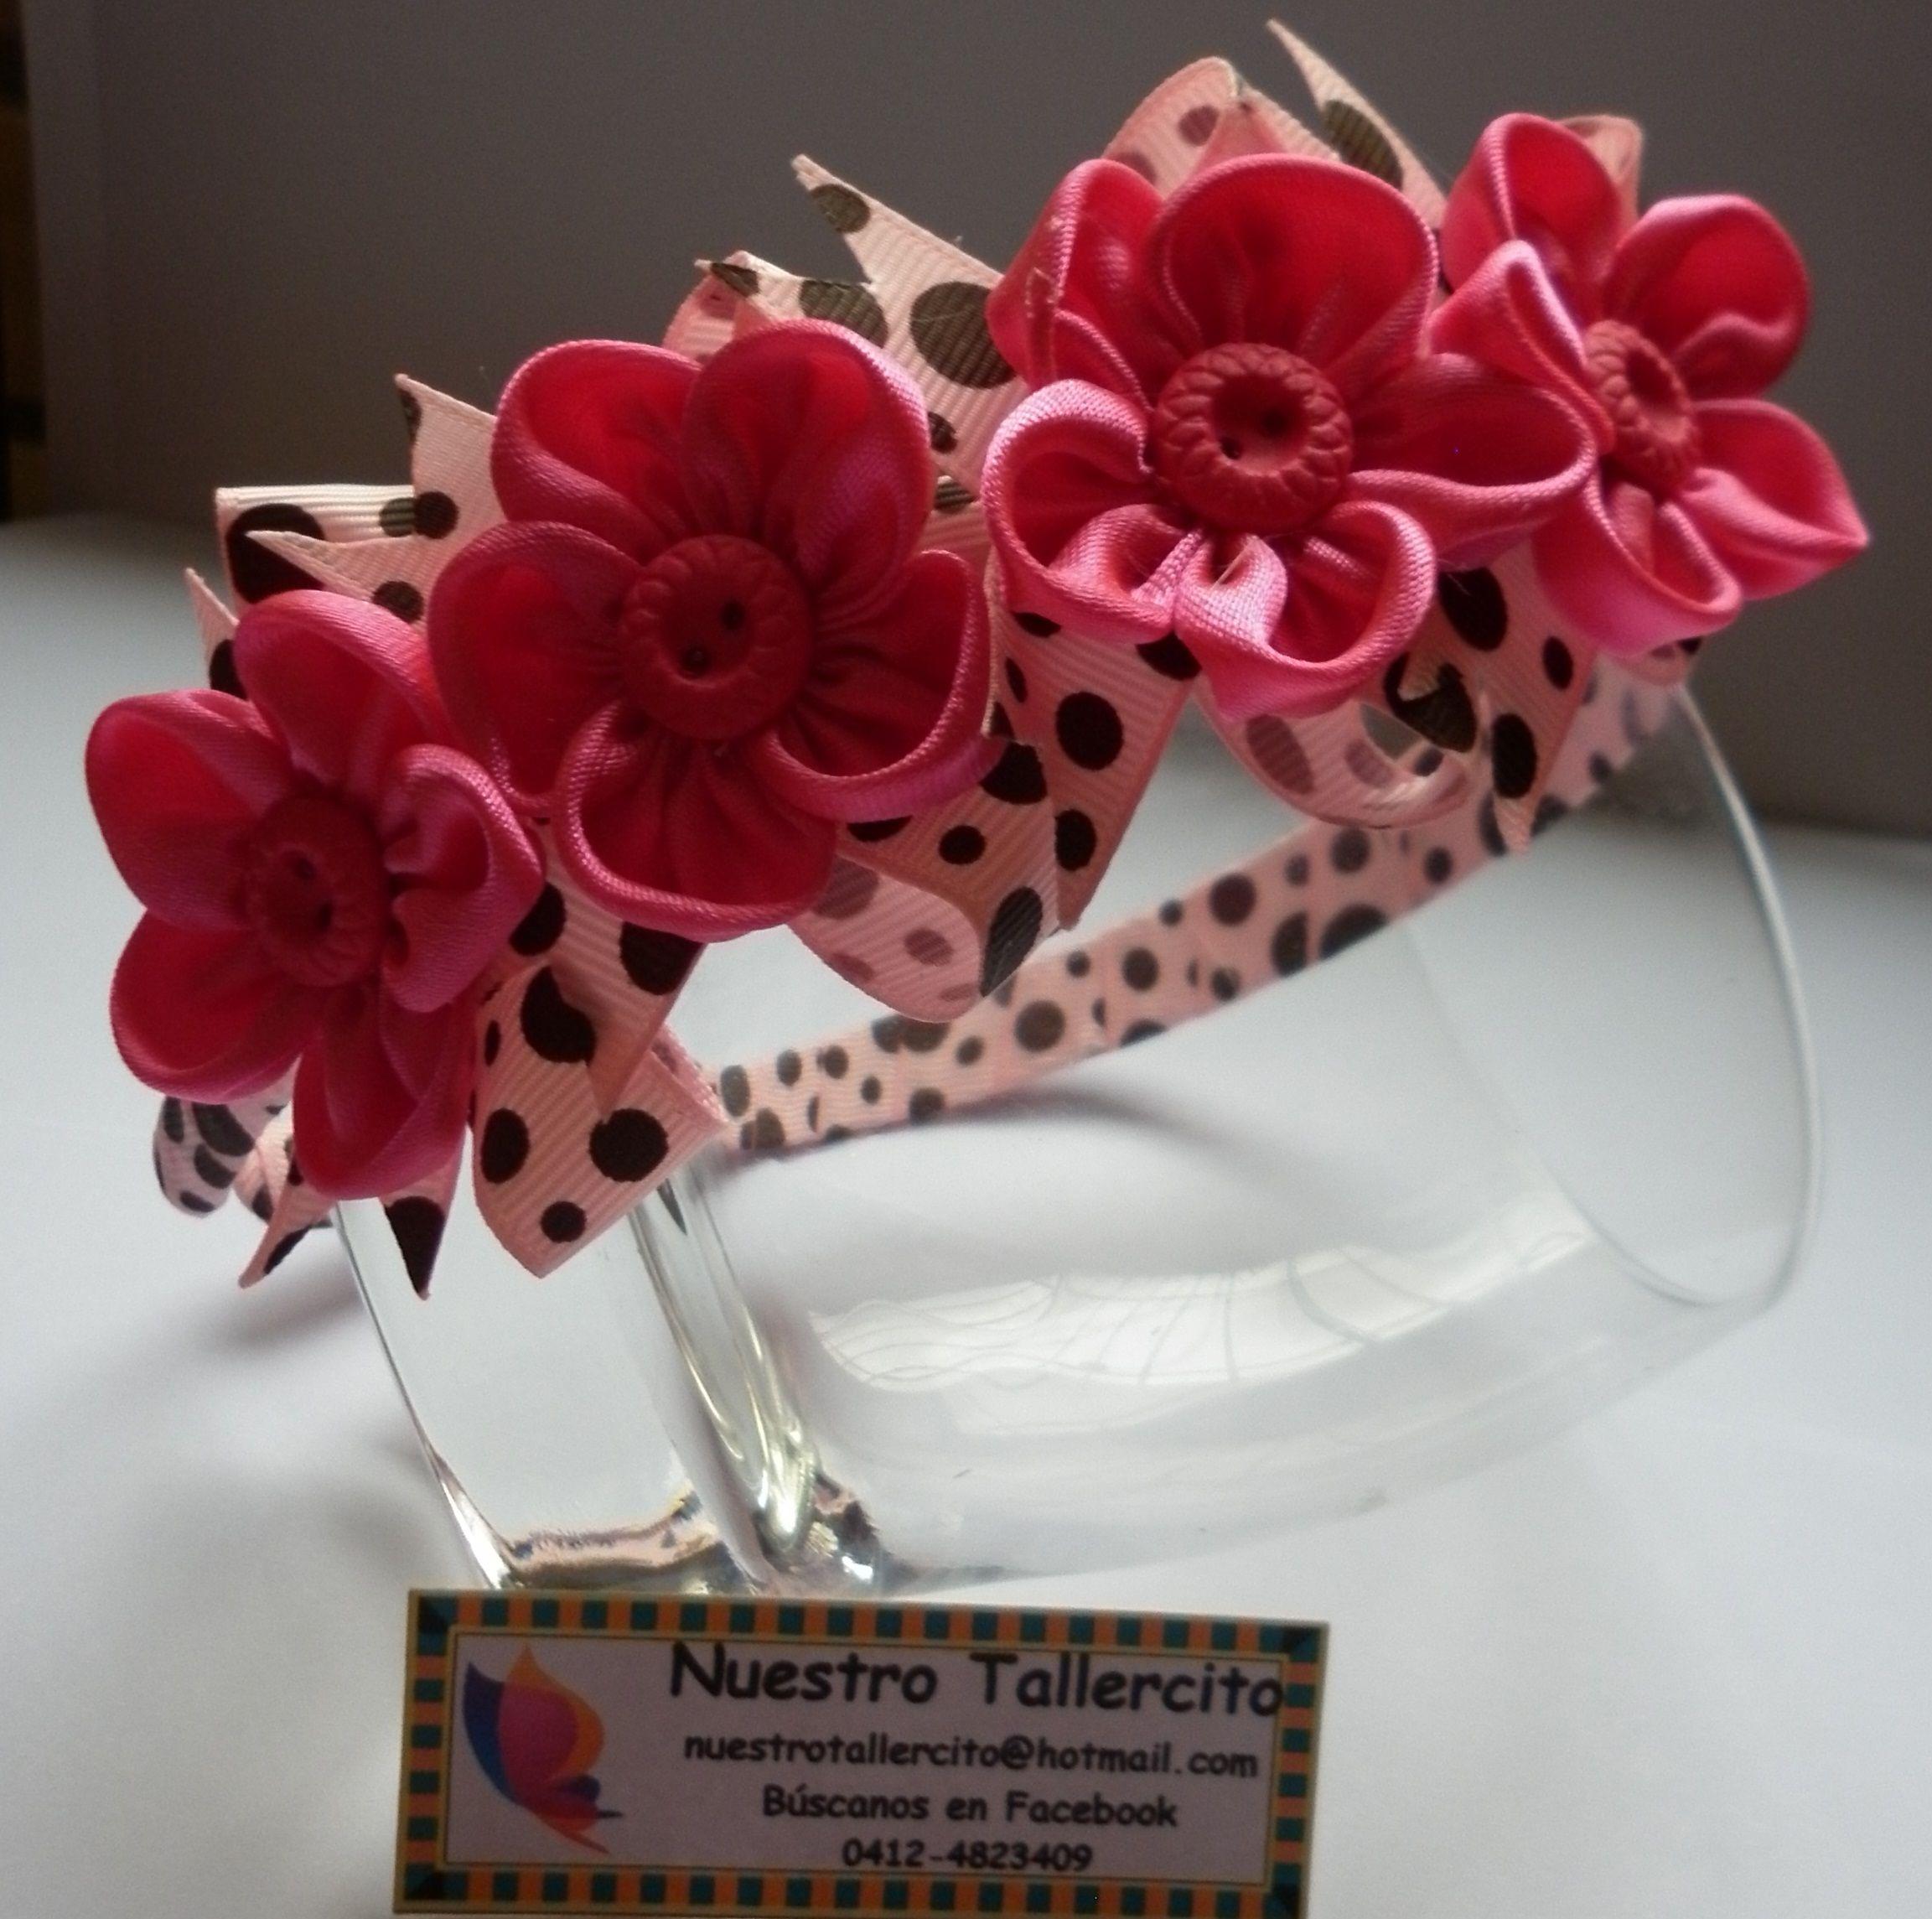 artesanato cabea do beb laos de fita flores de tecido tiaras headbands penteado acessrios de cabelo accesorios pelo